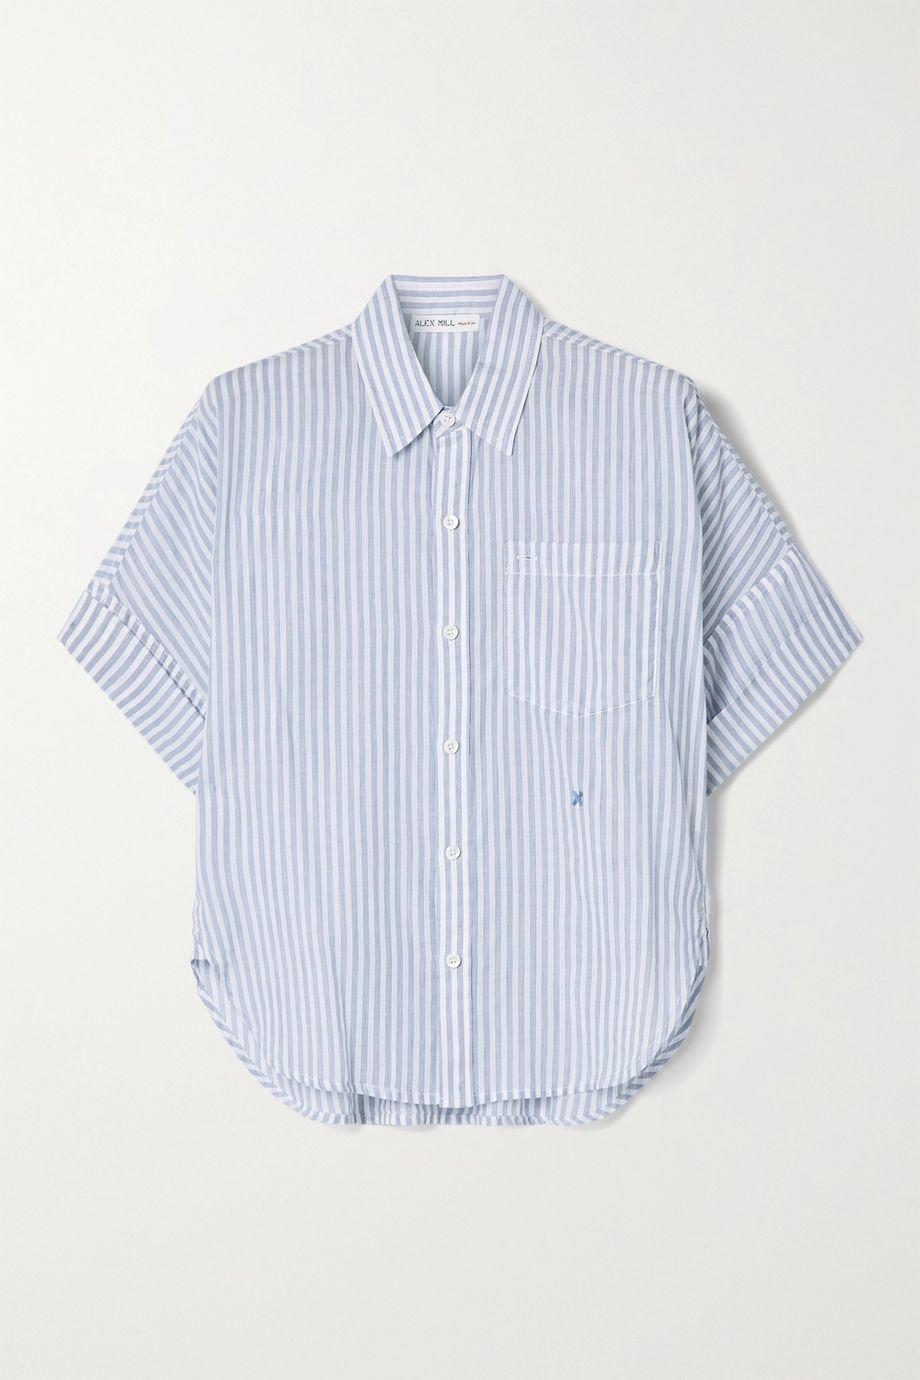 Alex Mill Charlie striped cotton-voile shirt